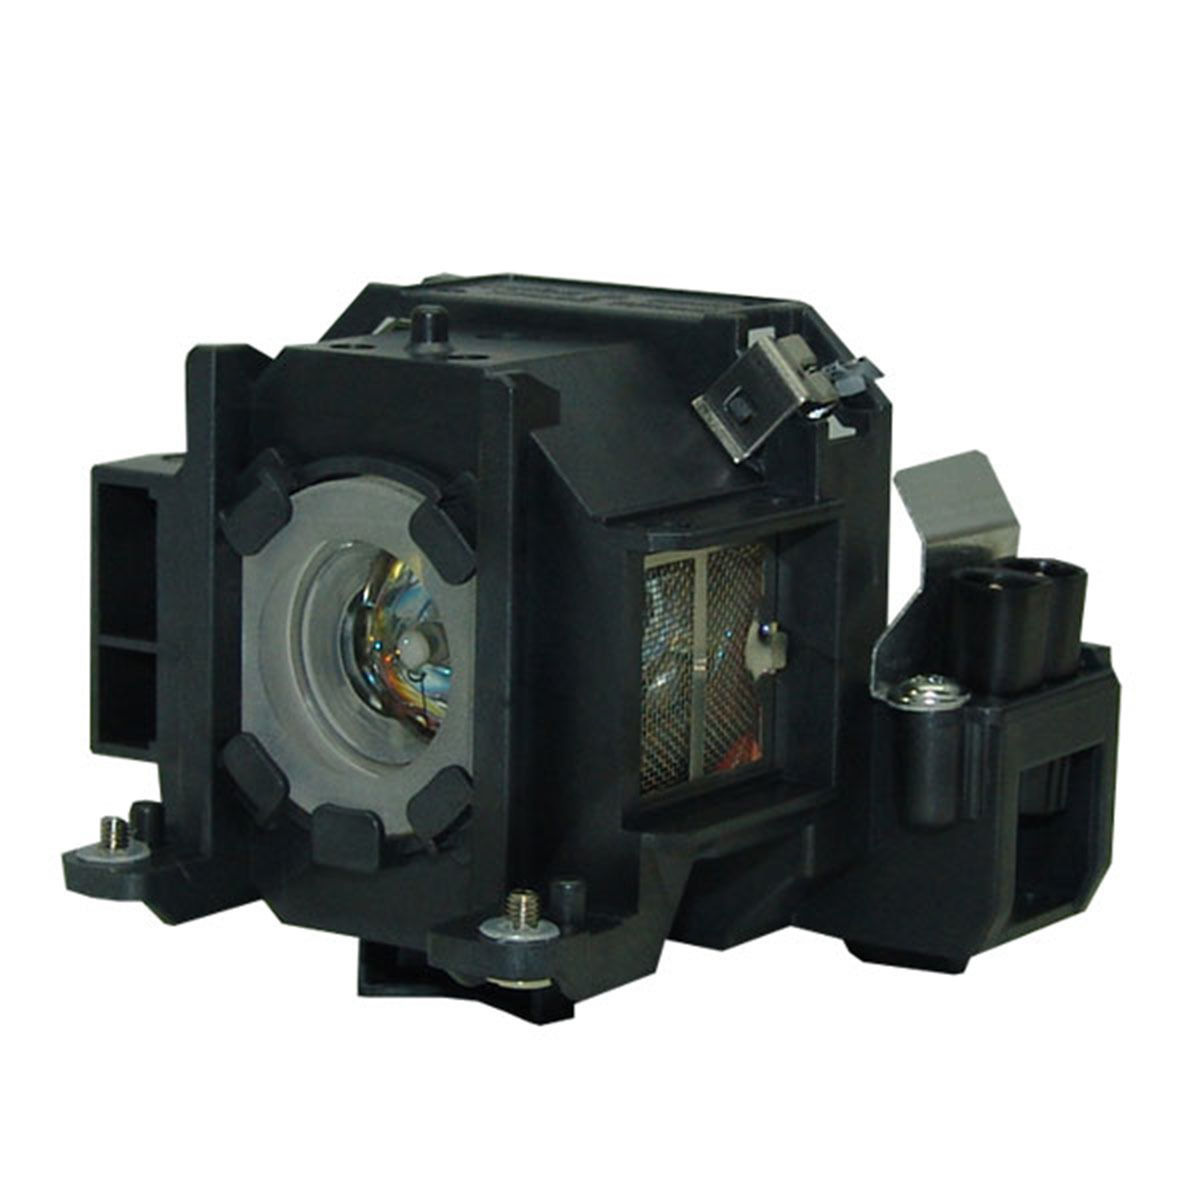 Projector Lamp Bulb ELPLP38 V13H010L38 for Epson EMP-1705 EMP-1700 EMP-1707 EMP-1710 EMP-1715 EMP-1717 with housing